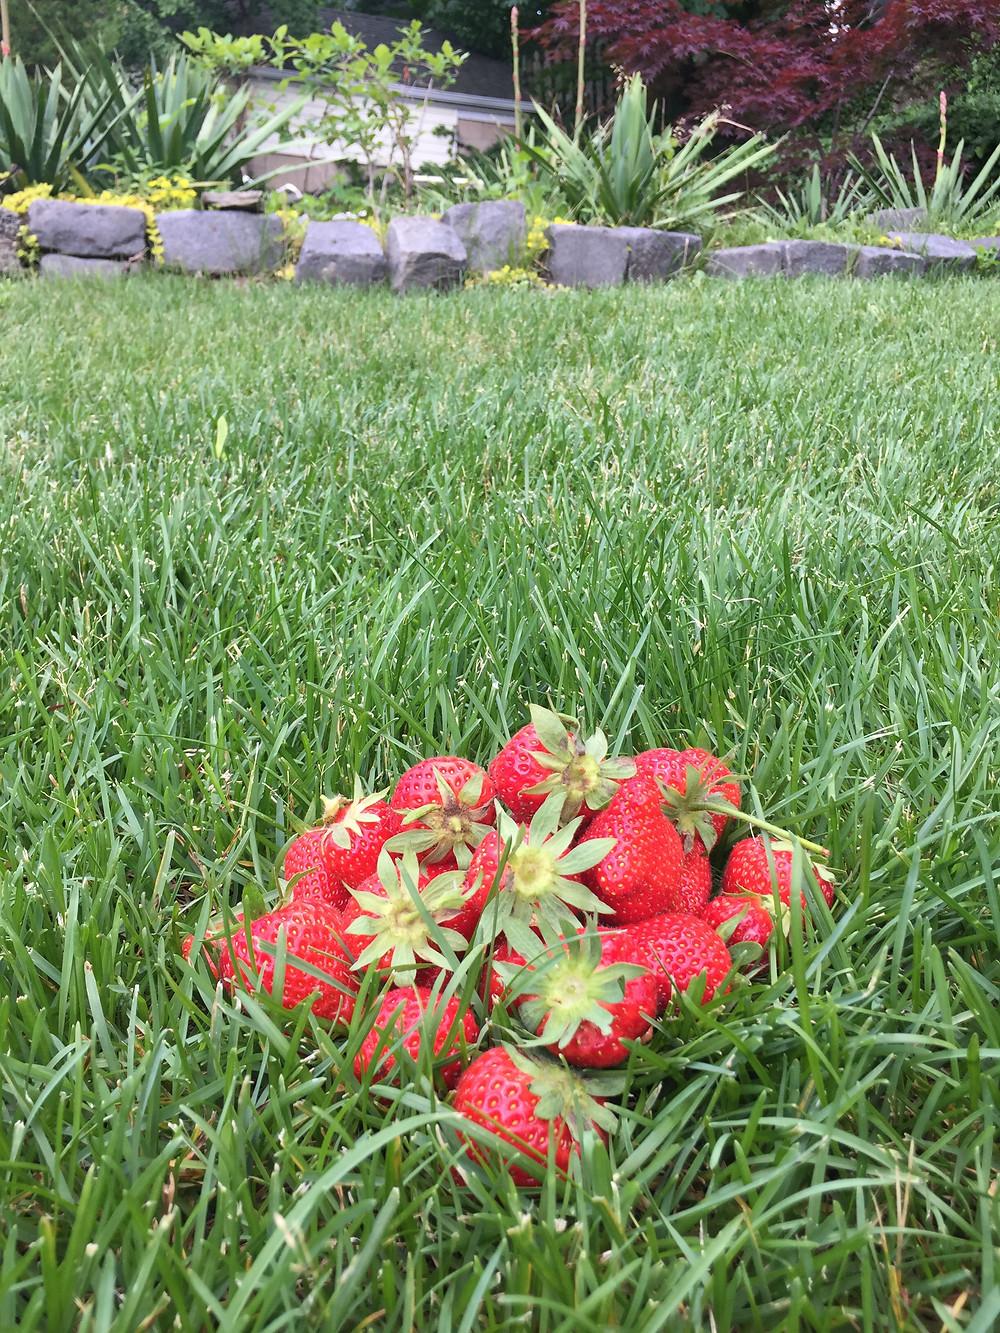 Last season's Strawberries